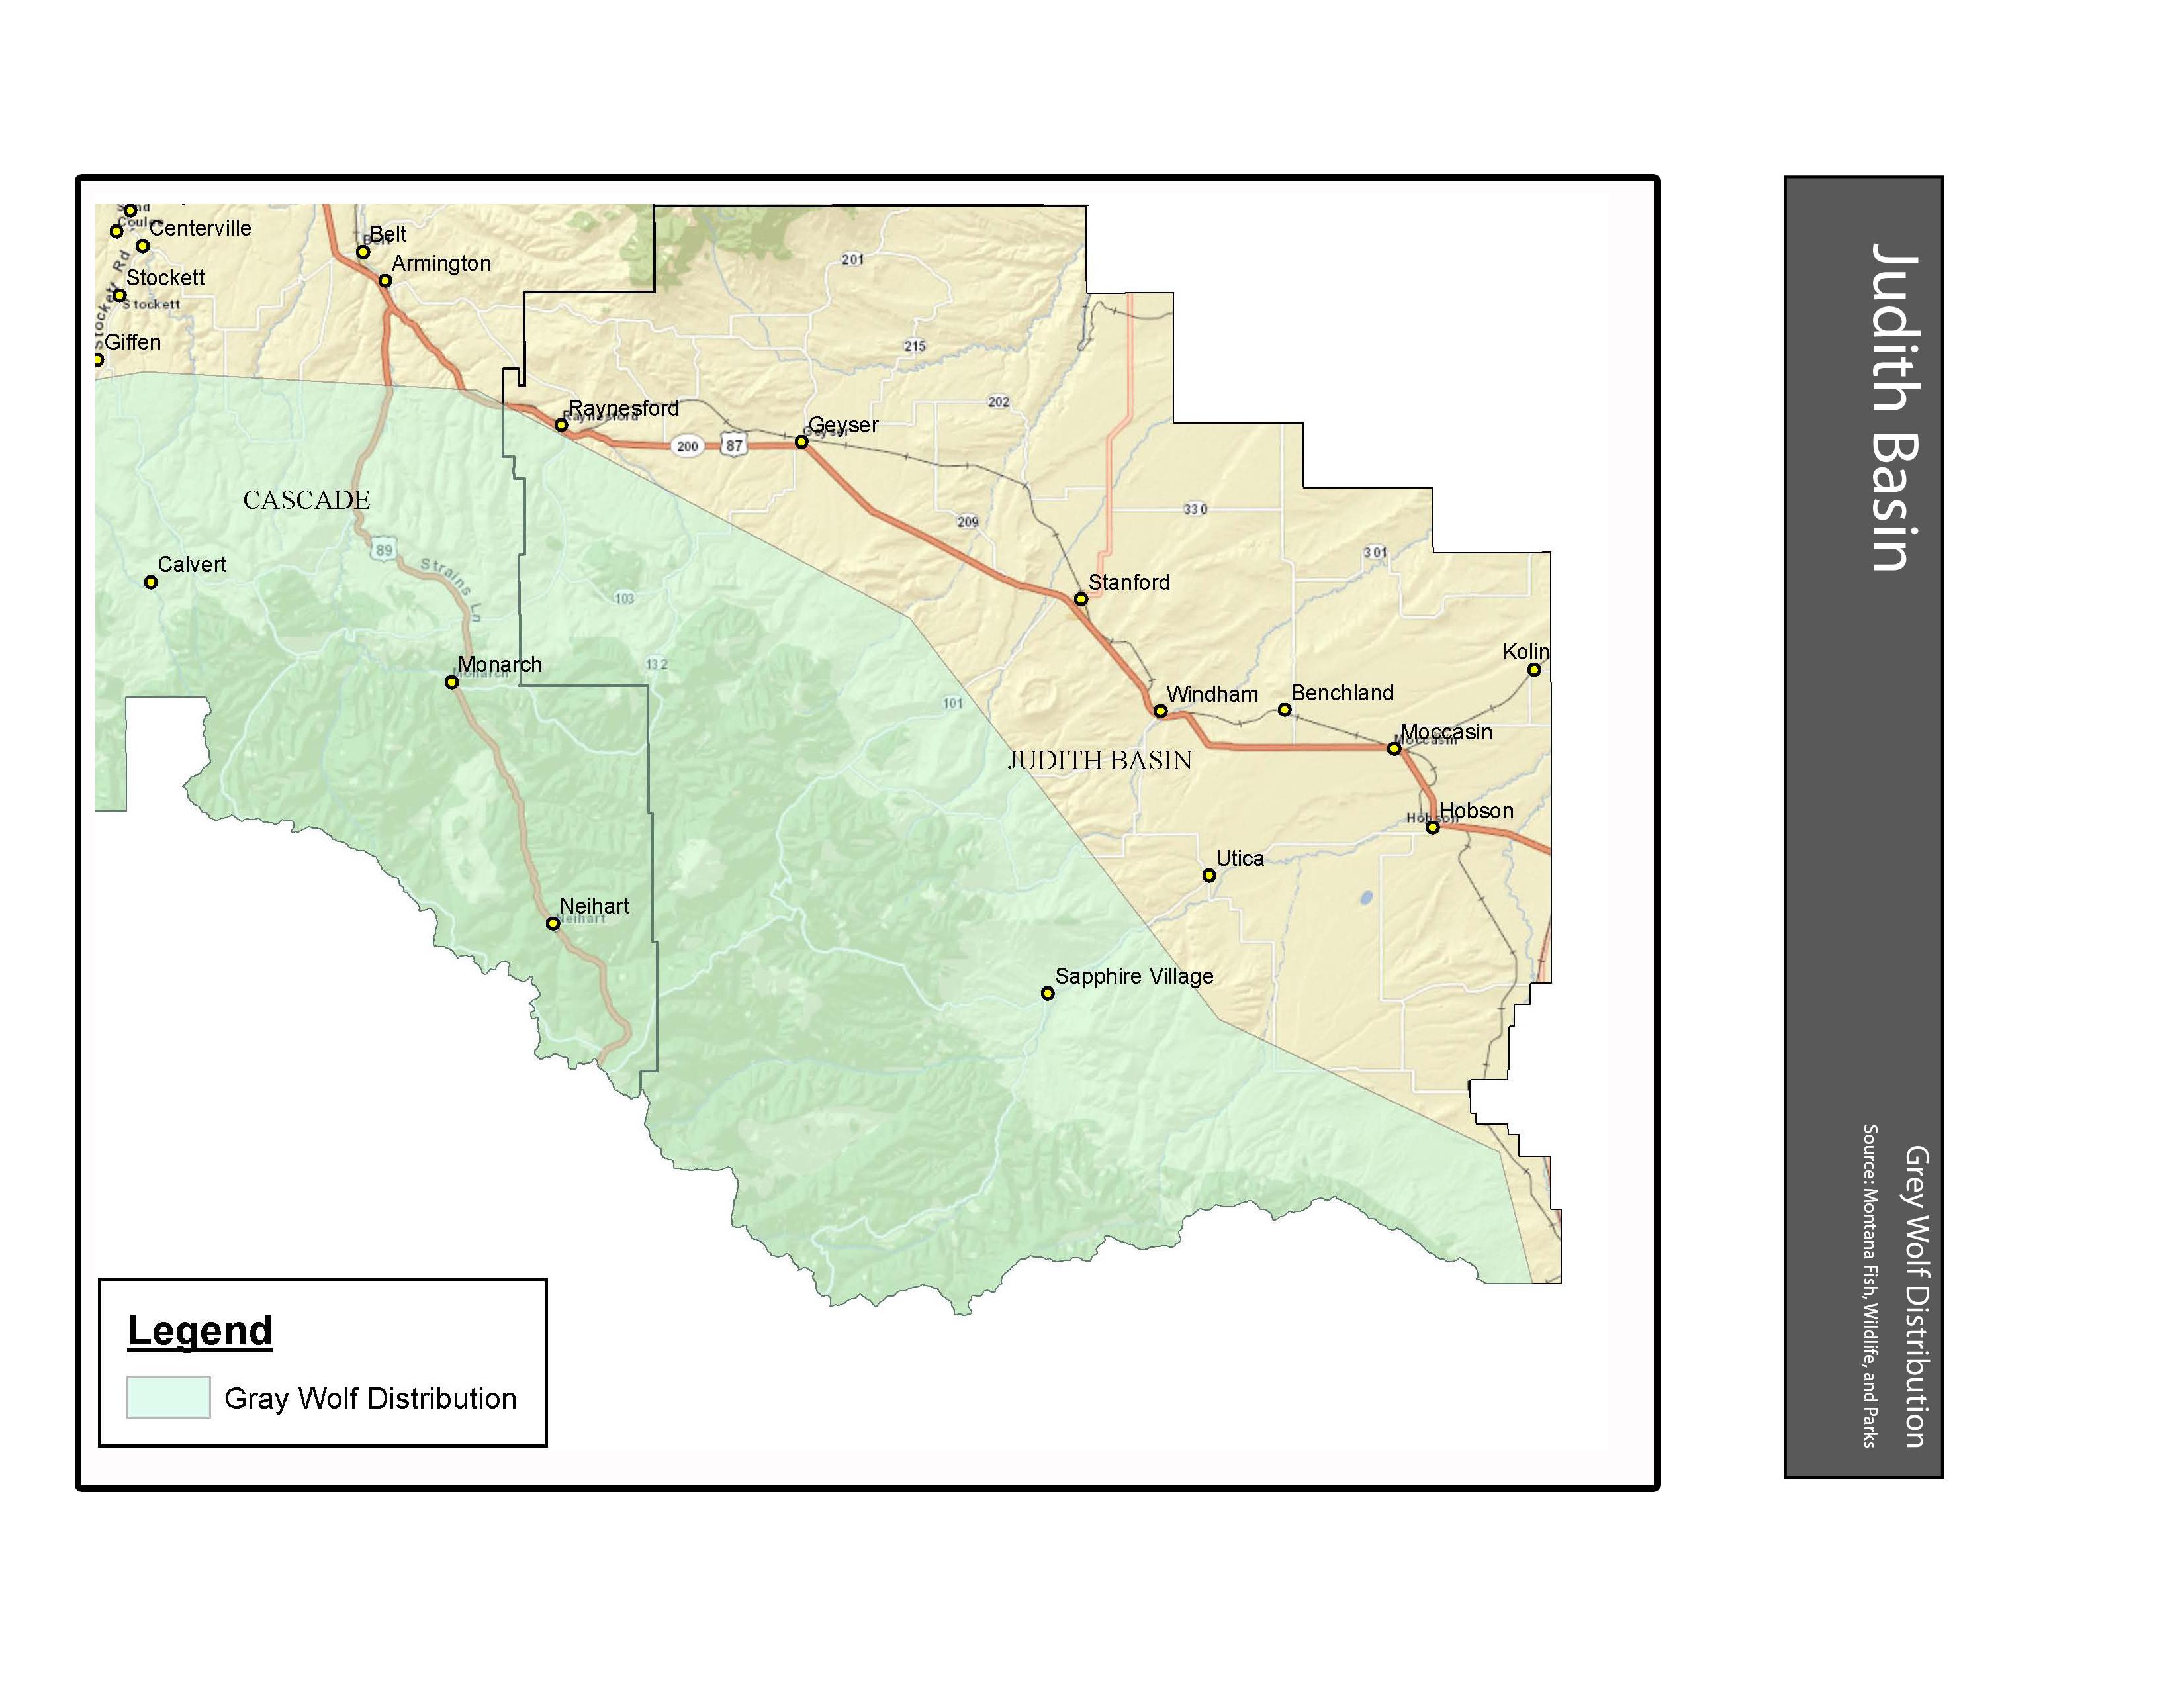 Gray Wolf Distribution Judith Basin County